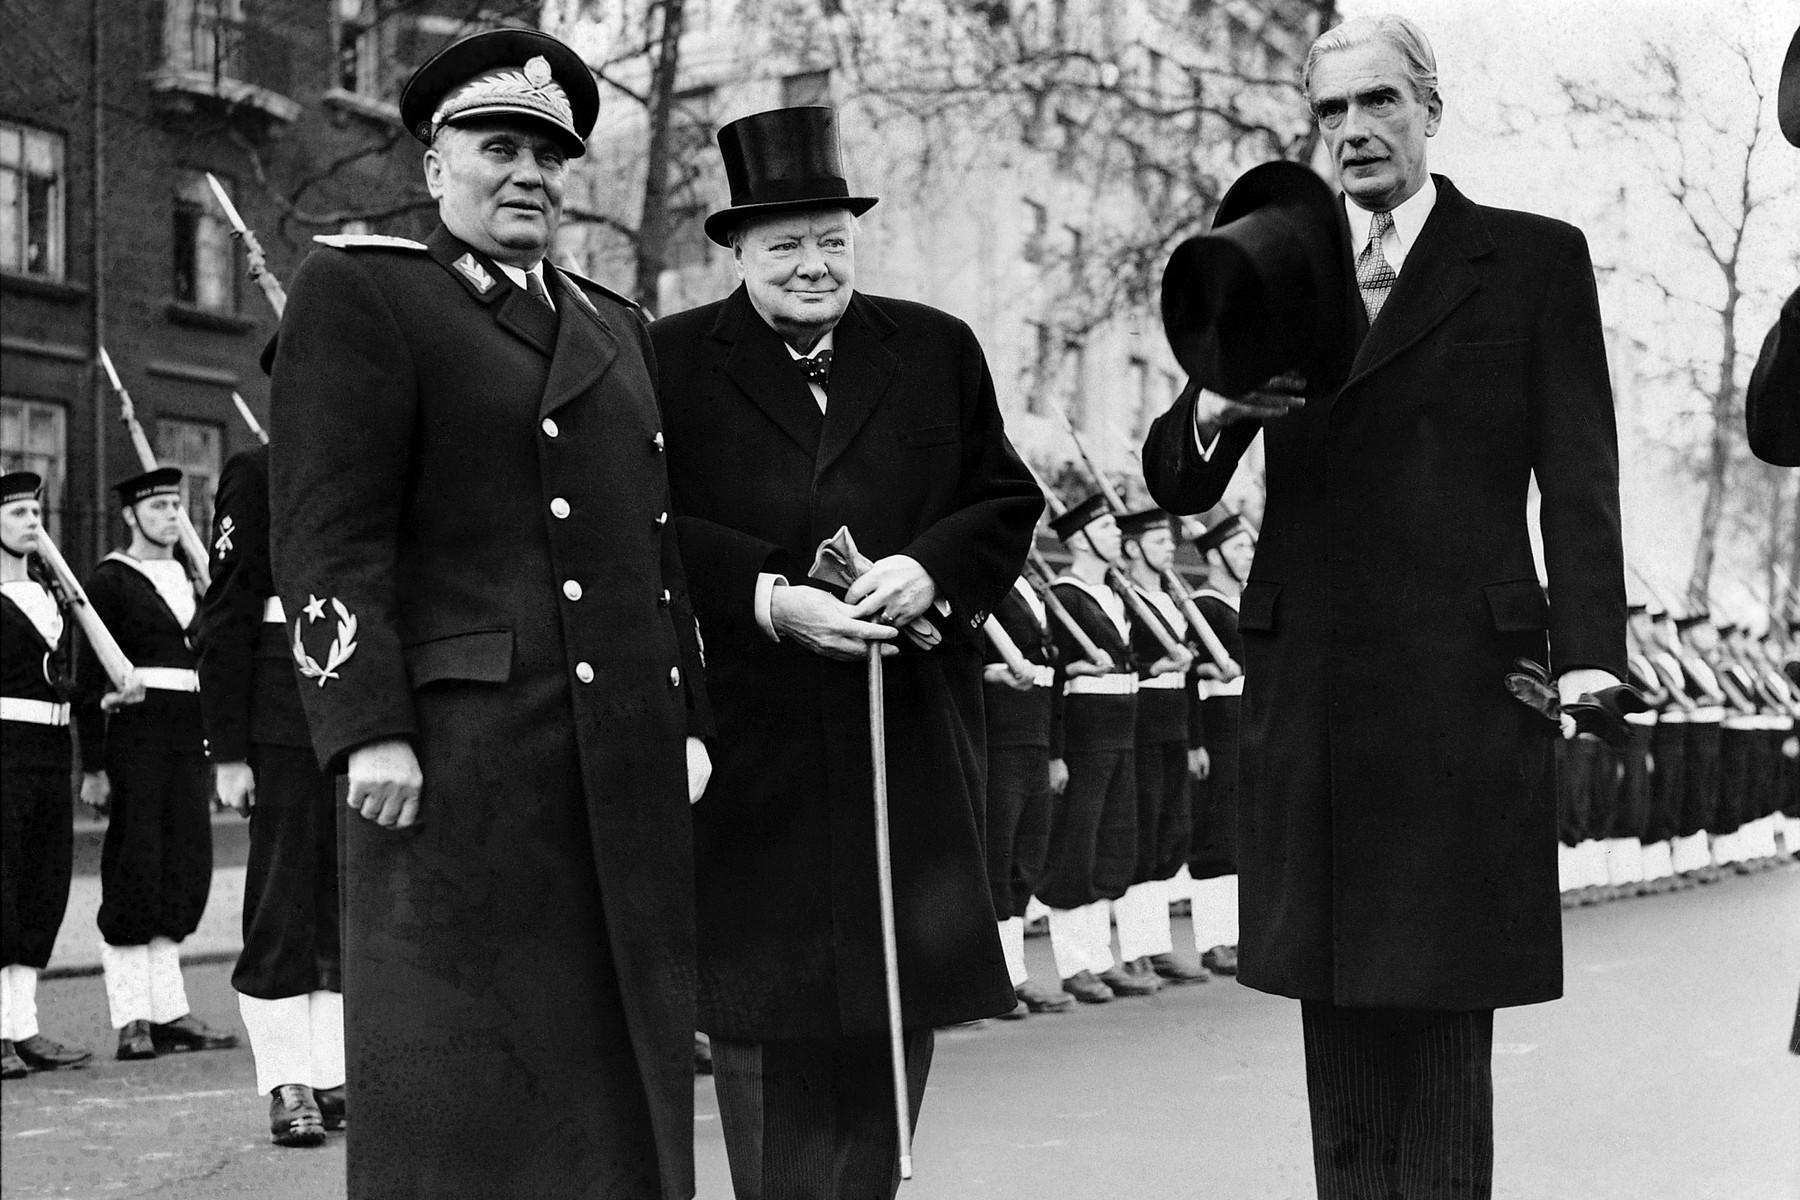 Josip Broz Tito i Vinston Čerčil i Entoni Idn u Londonu, 16. mart 1953. (Foto: Keystone-France/Gamma-Rapho via Getty Images)